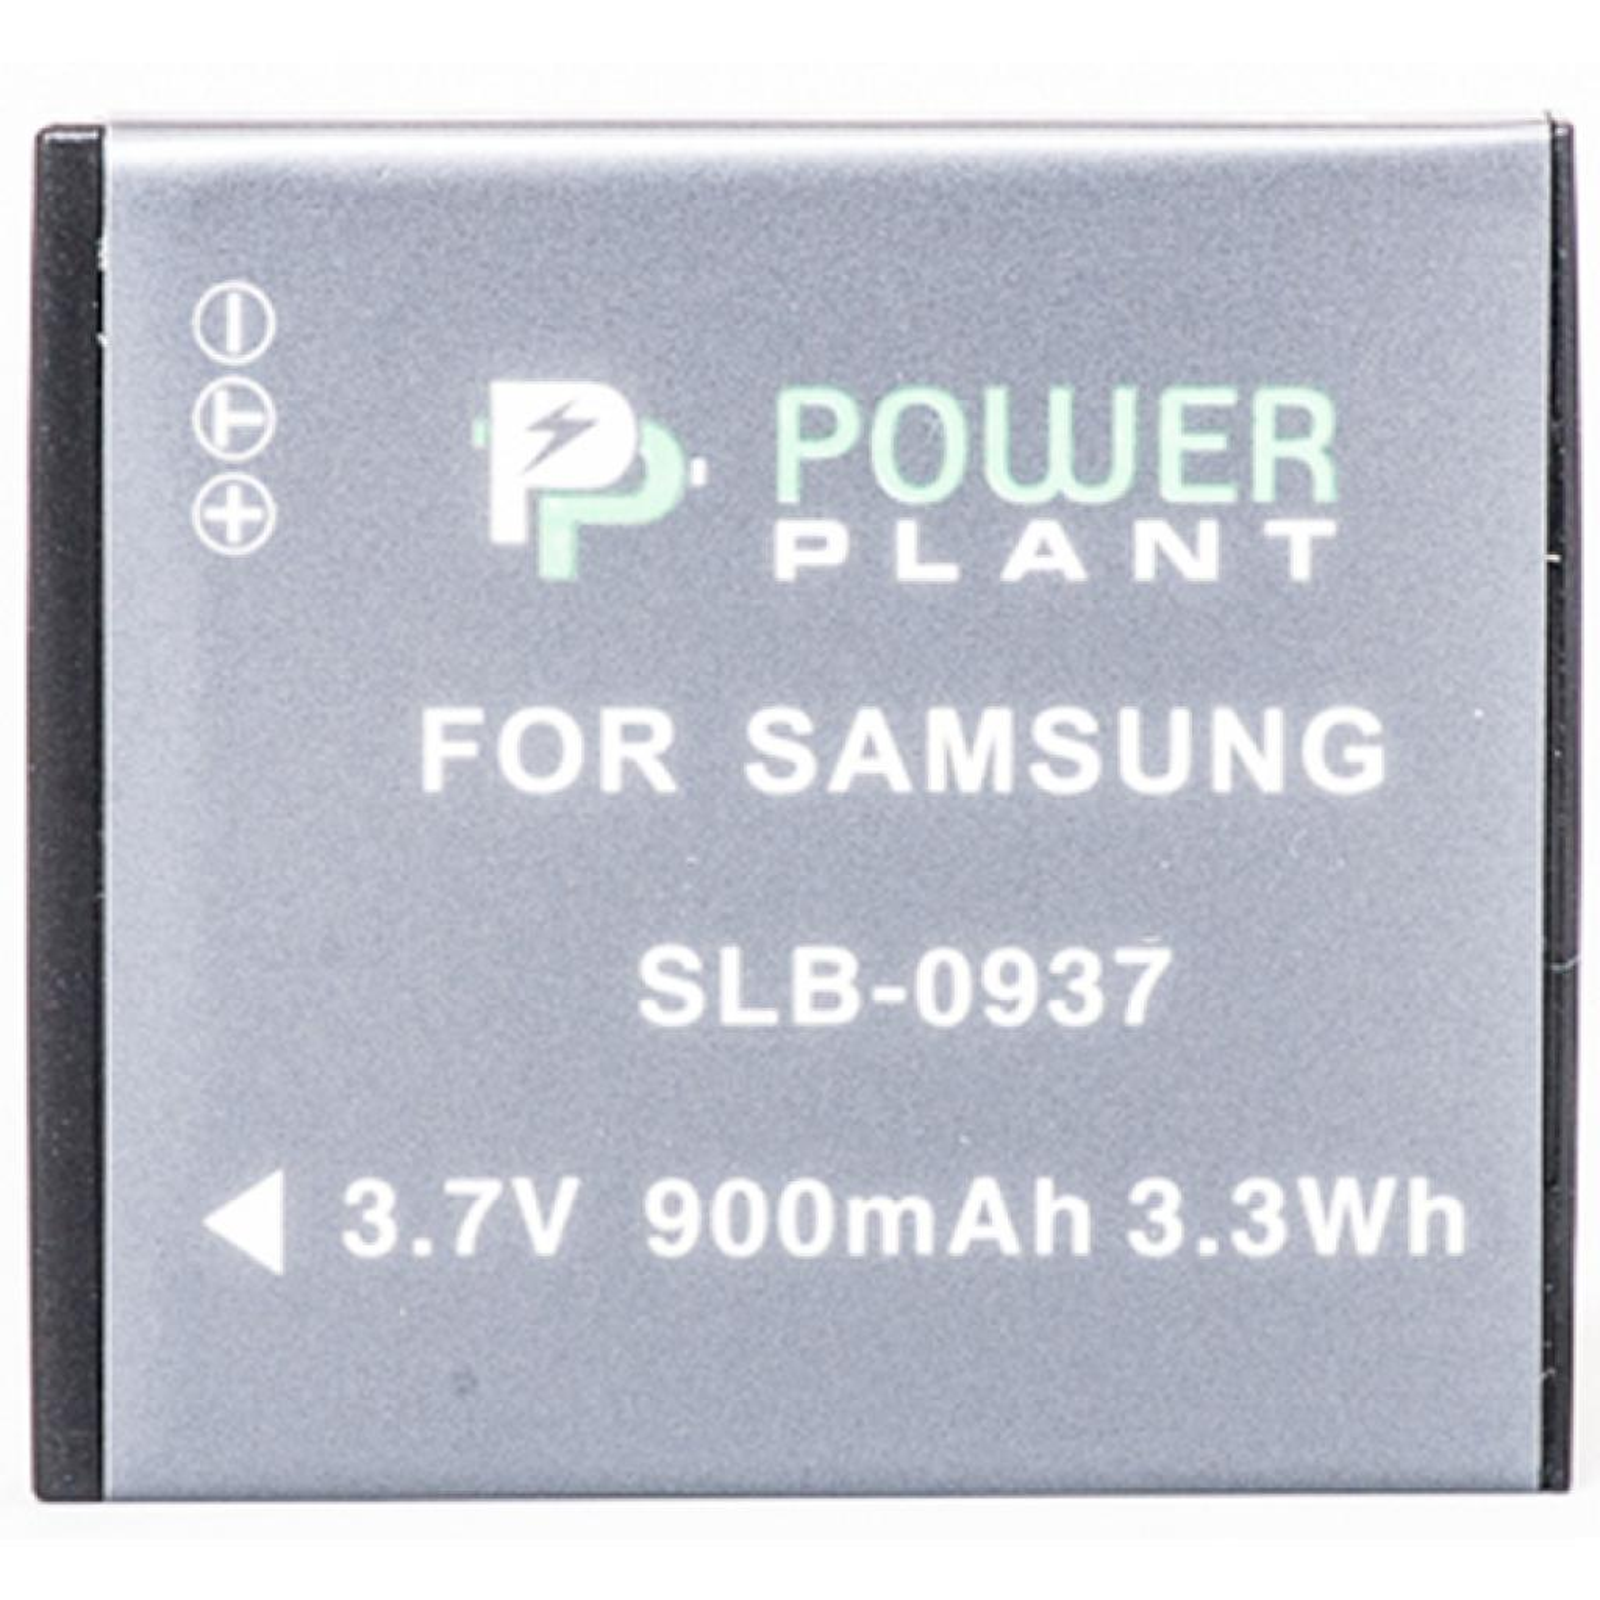 Аккумулятор к фото/видео PowerPlant Samsung SLB-0937 (DV00DV1210) изображение 2